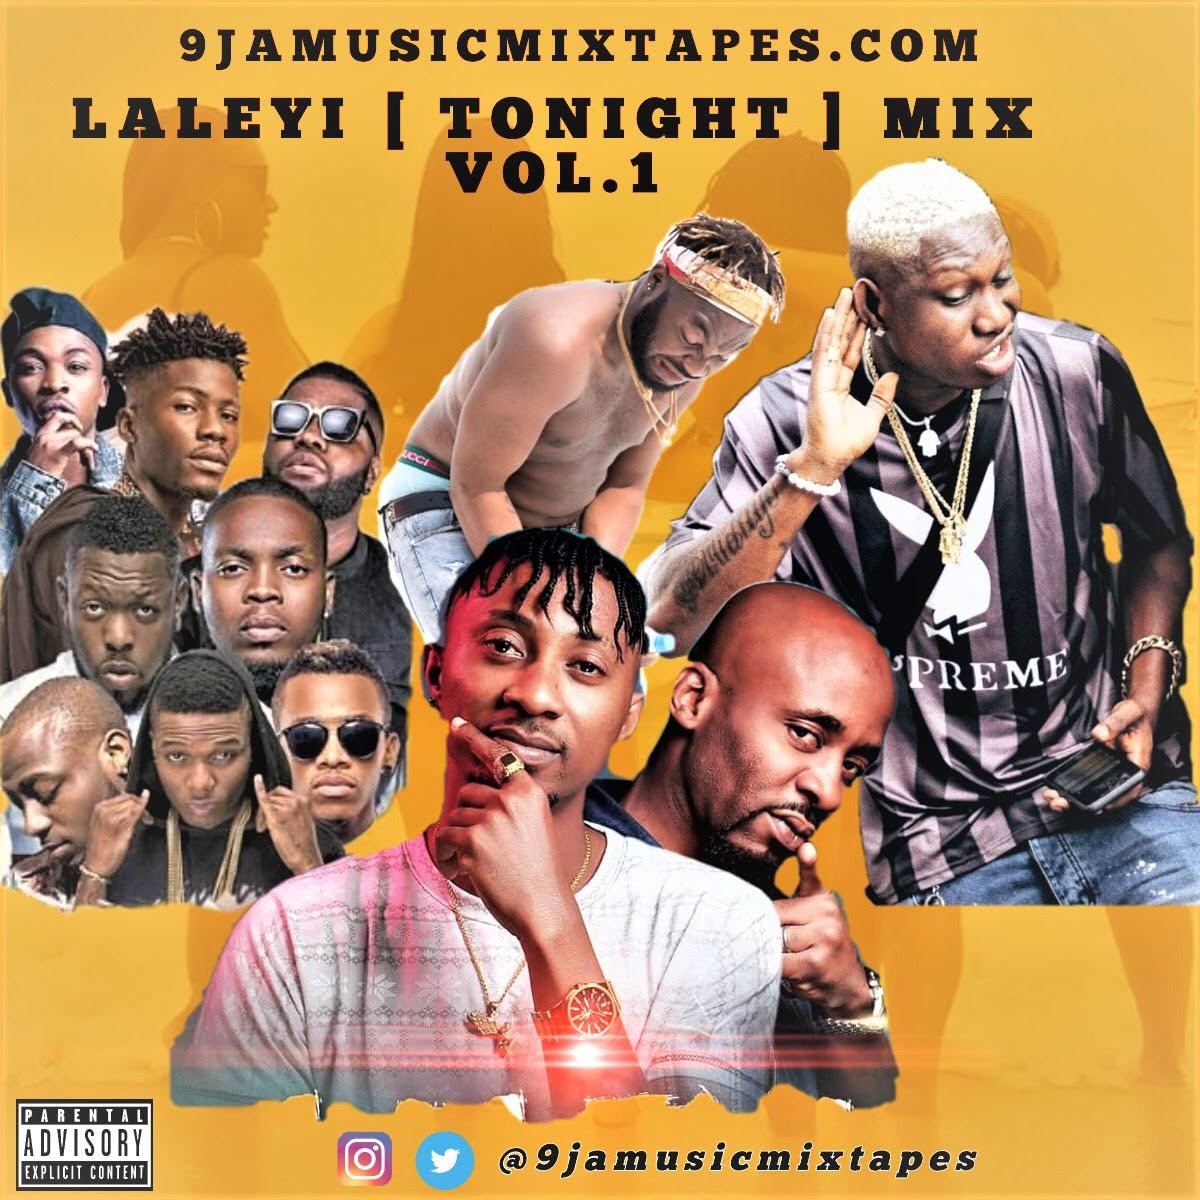 Mixtape: Laleyi [ Tonight ] Mix Vol.1 Hosted By DJ Que [ @Wflamed ] @Superstar_knas @Iamben4ster